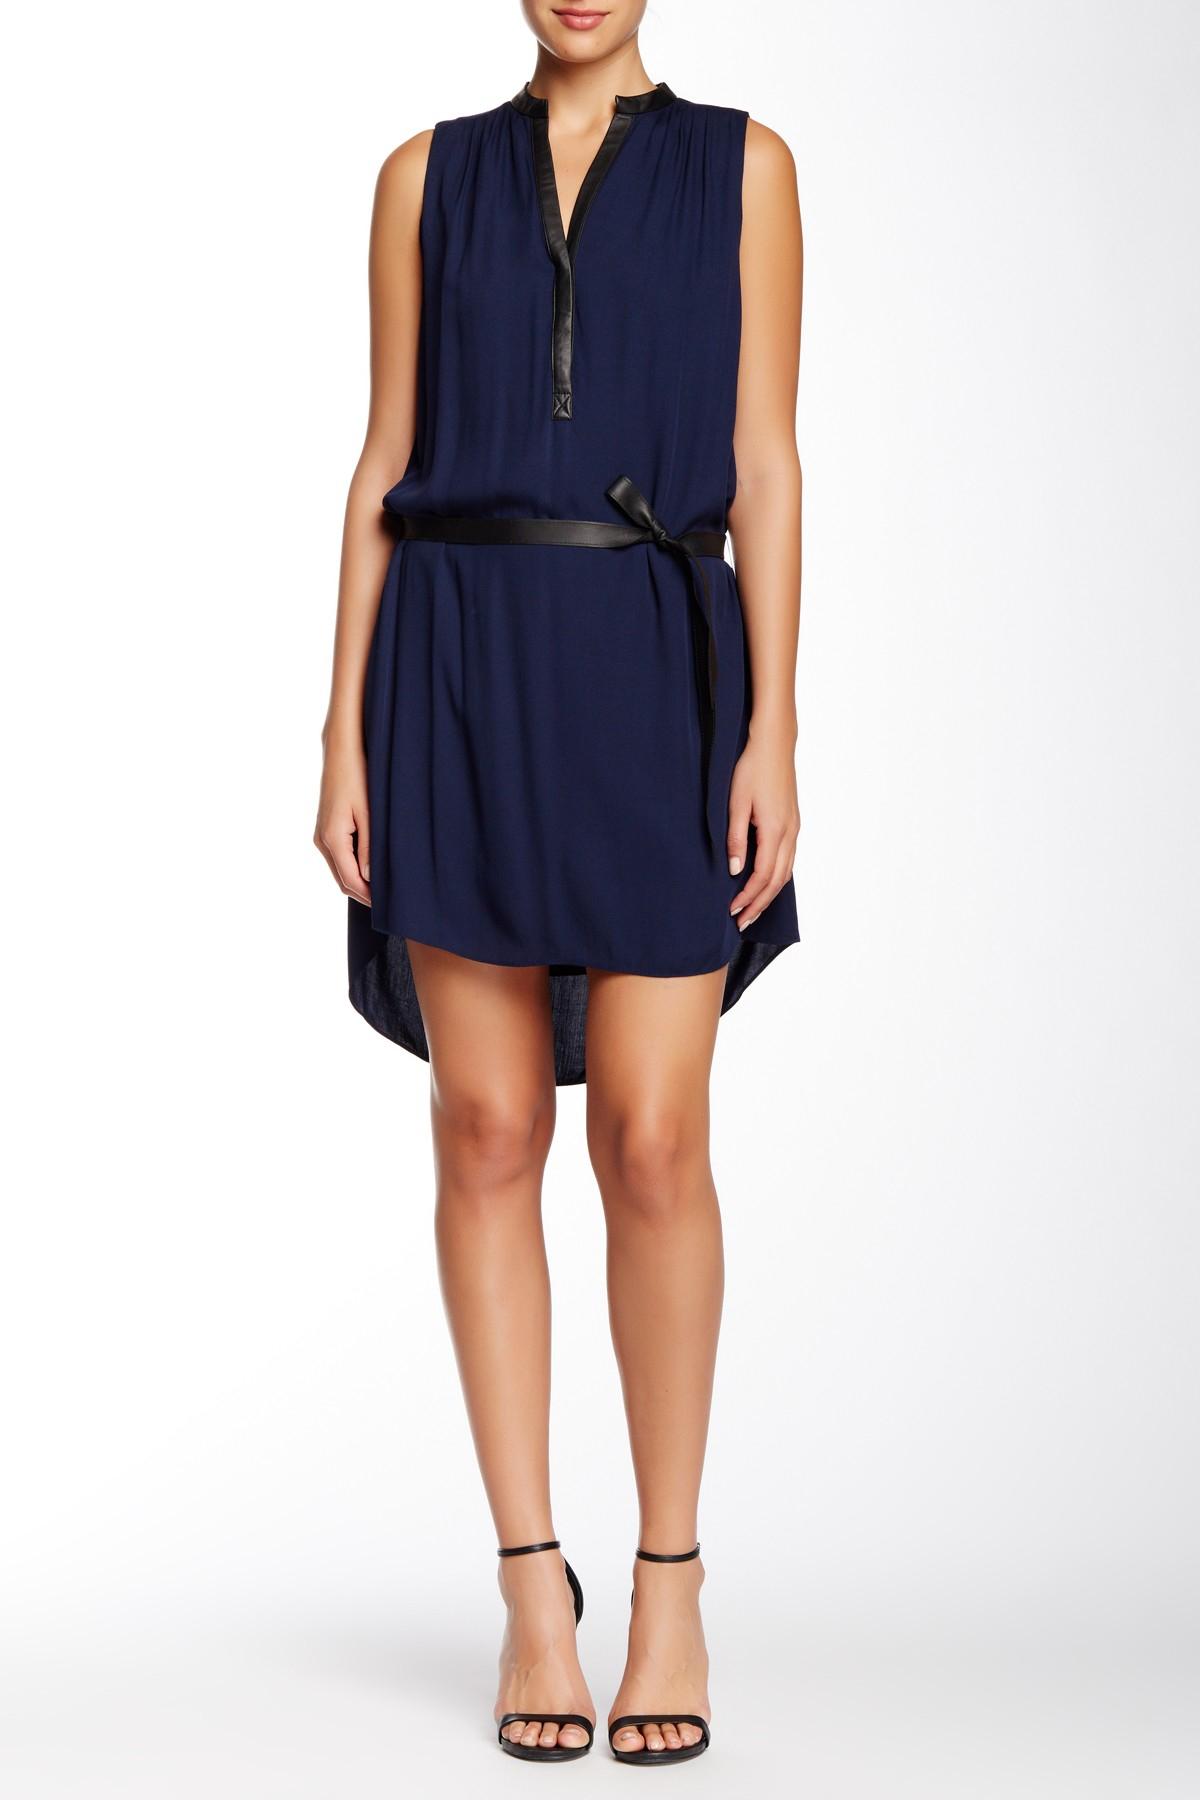 Alice Olivia Berk Leather Combo Hi Lo Dress In Blue Lyst